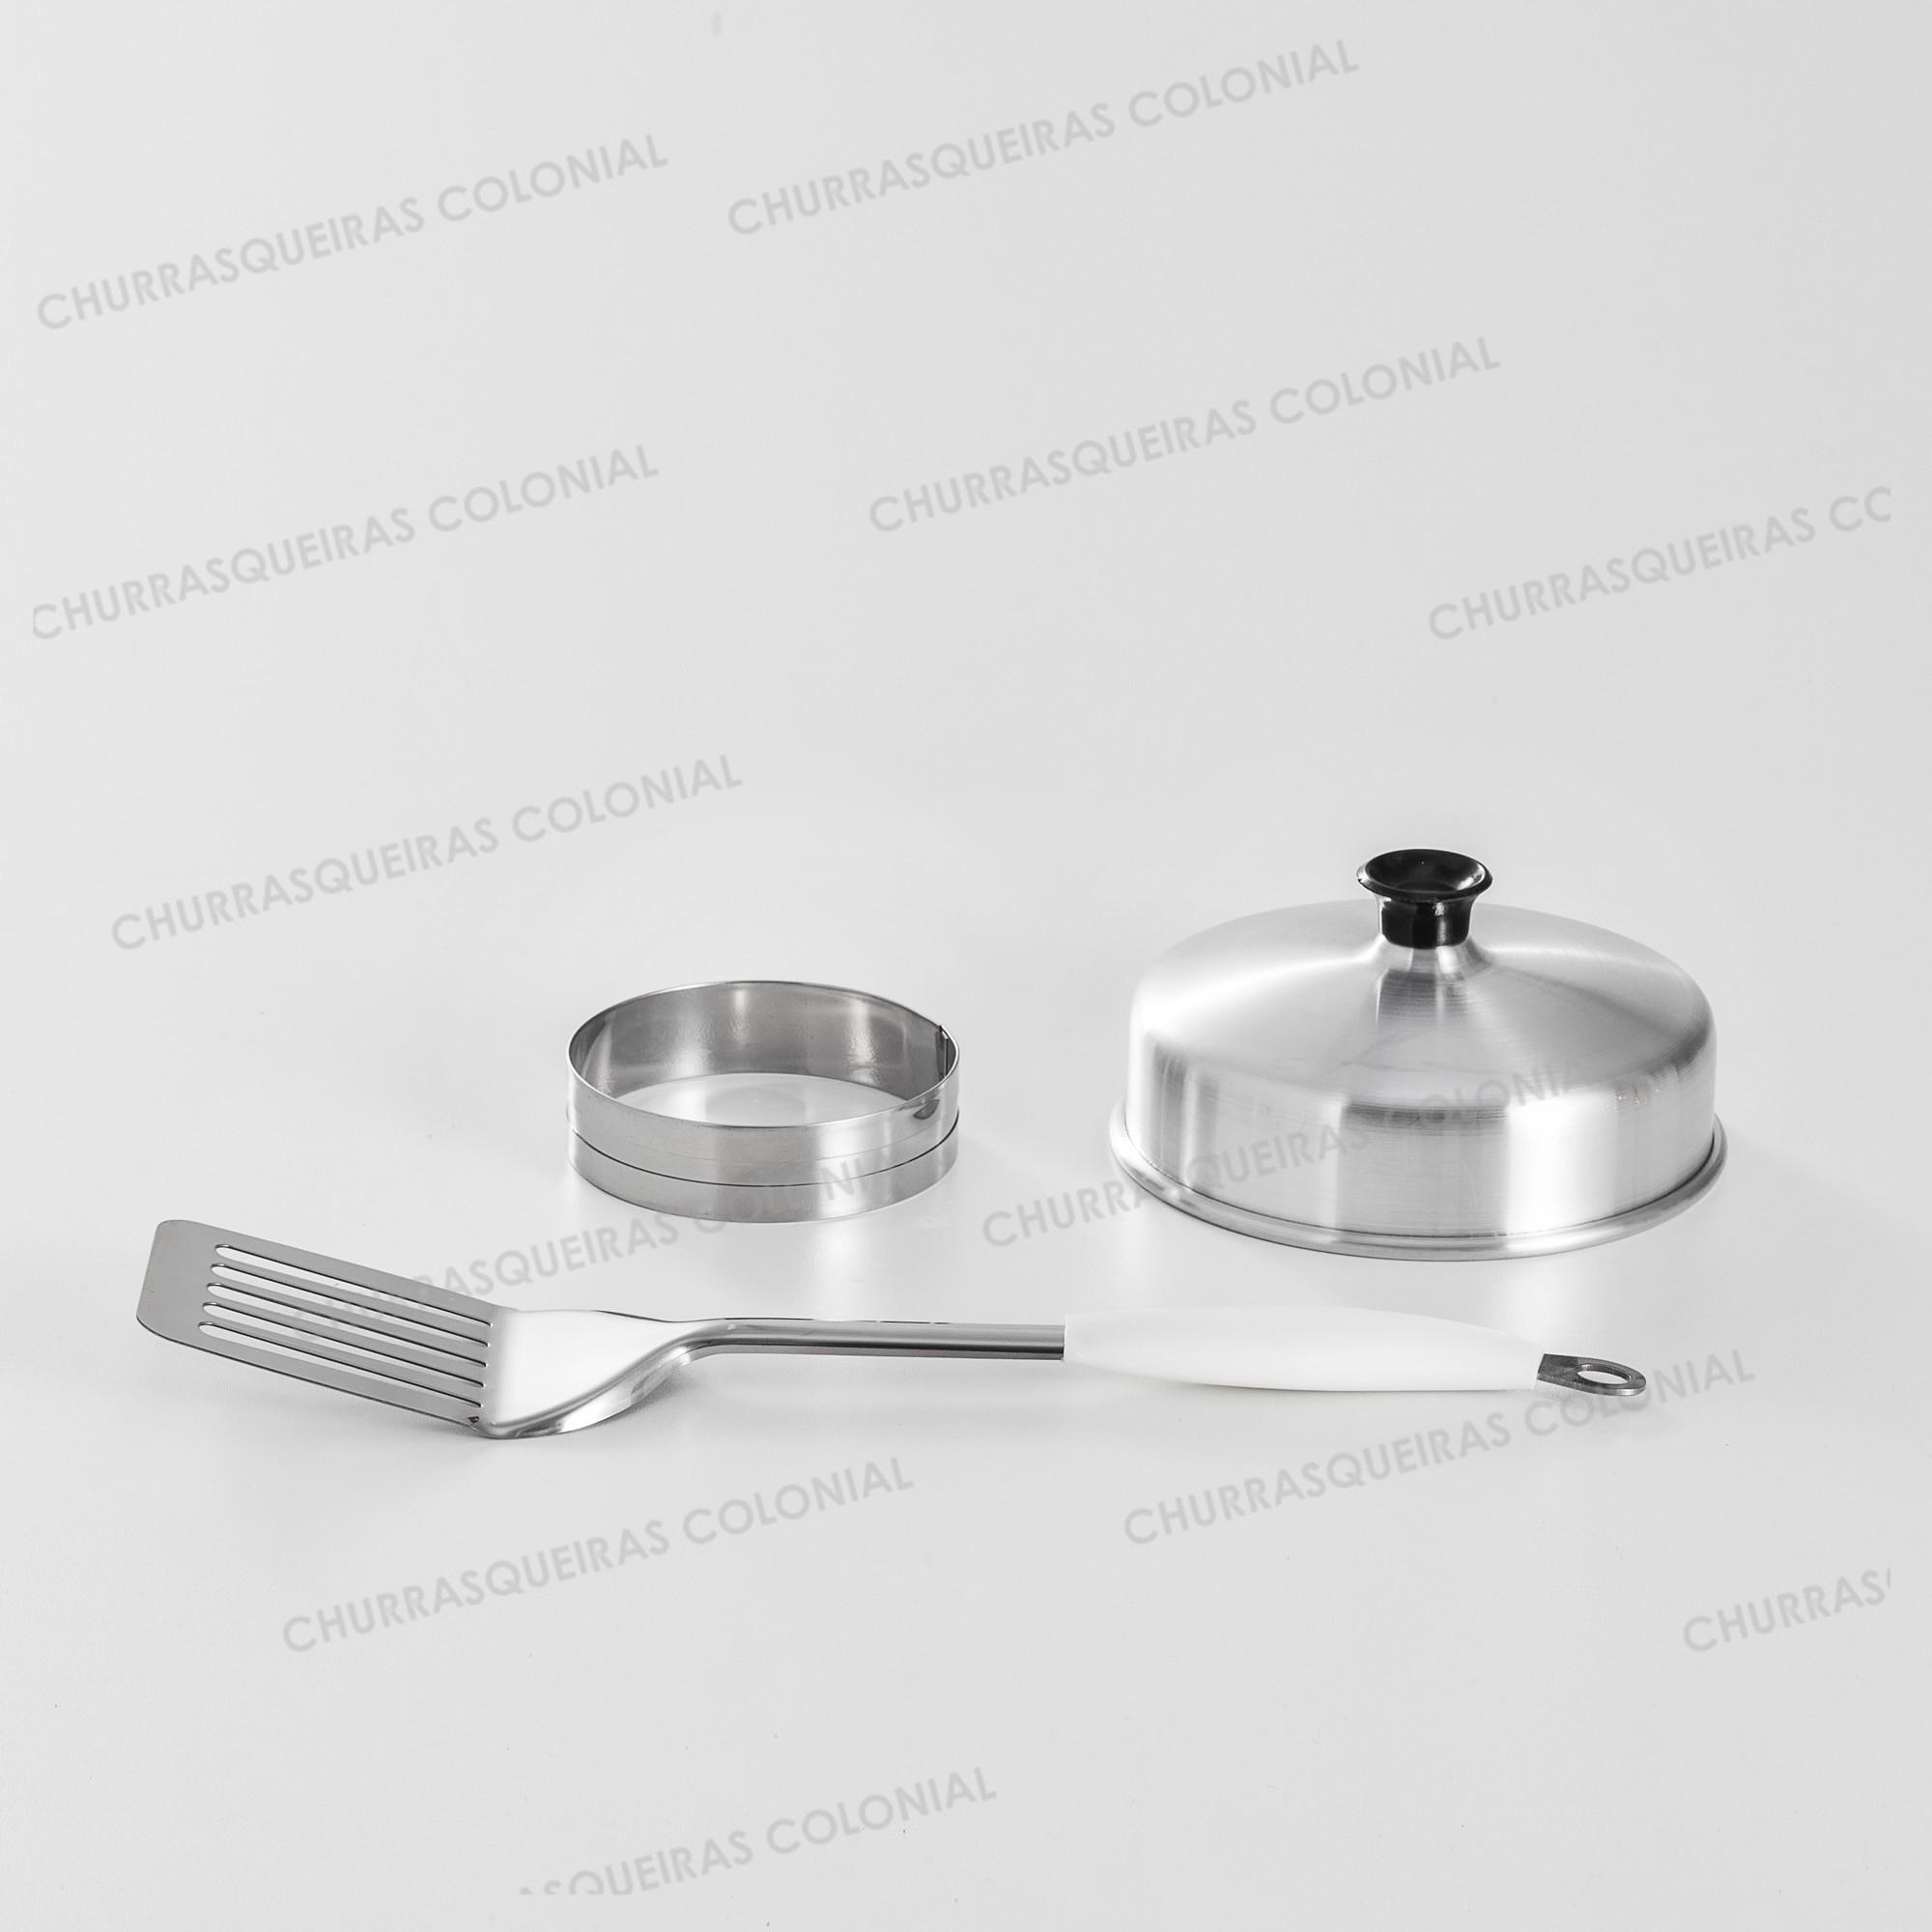 Kit 3 peças para hamburguer Espátula 33 cm Cabo Branco Aro Modelador Hamburguer e Abafador